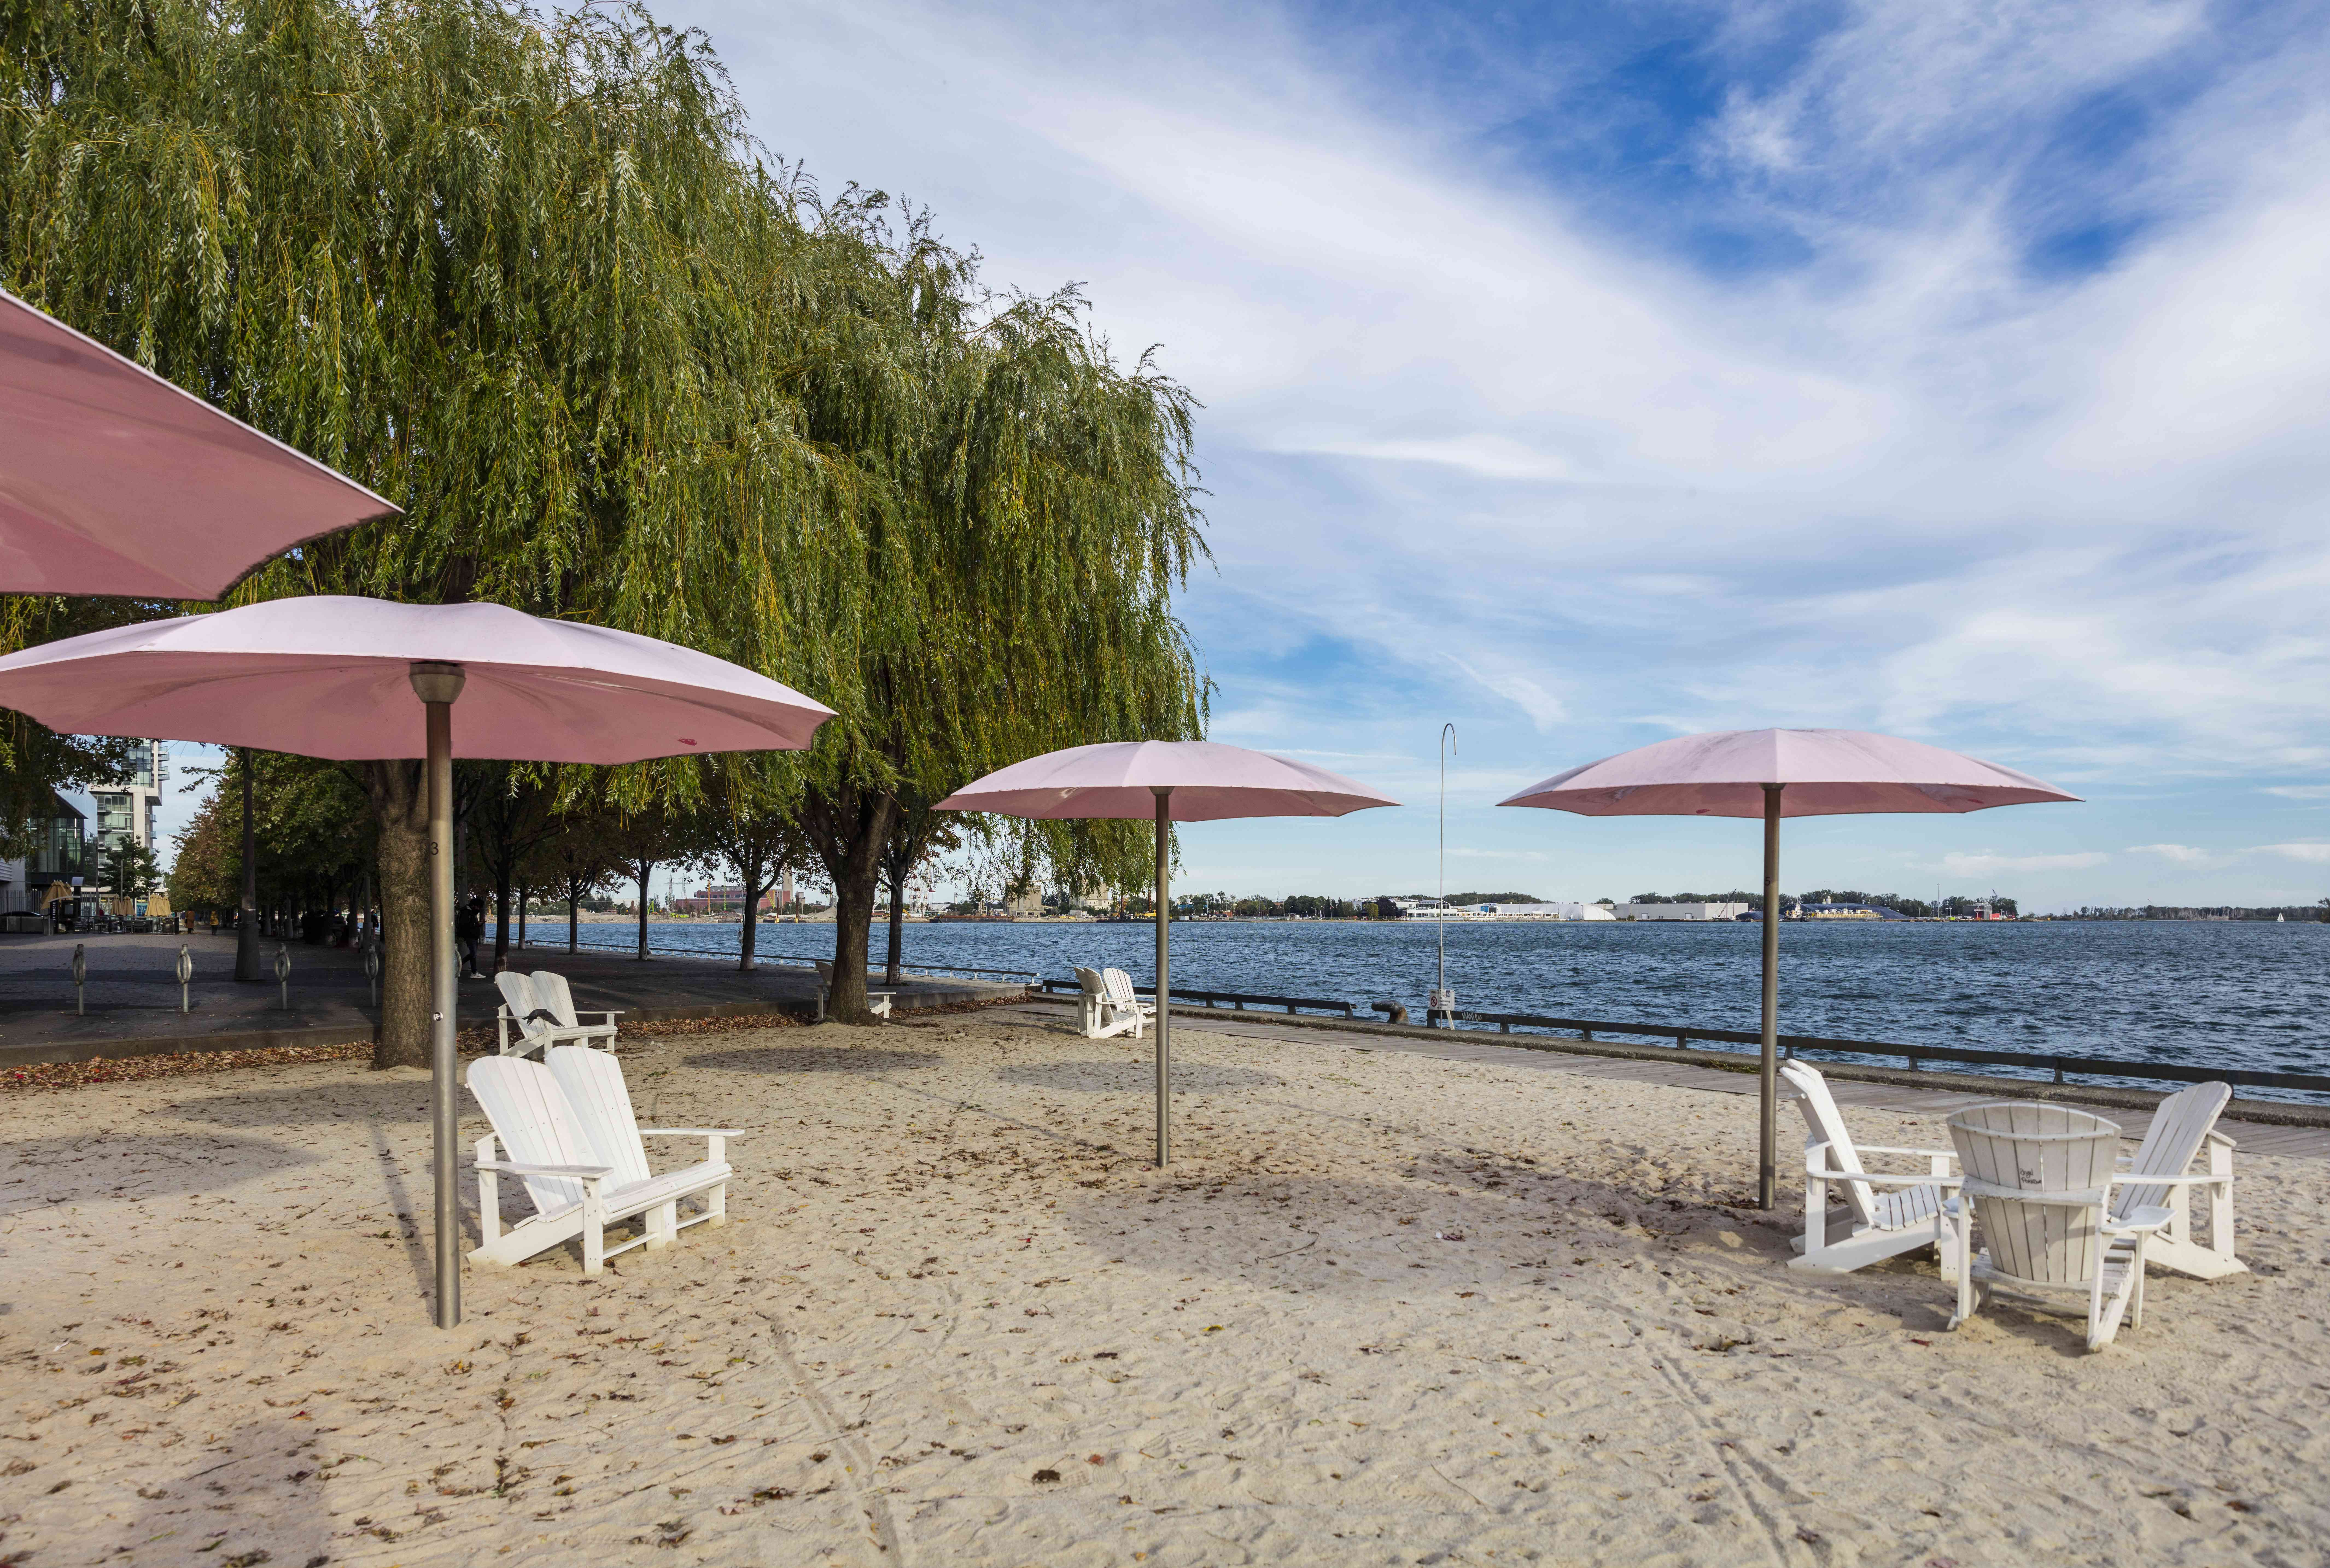 Sugar Beach in Toronto